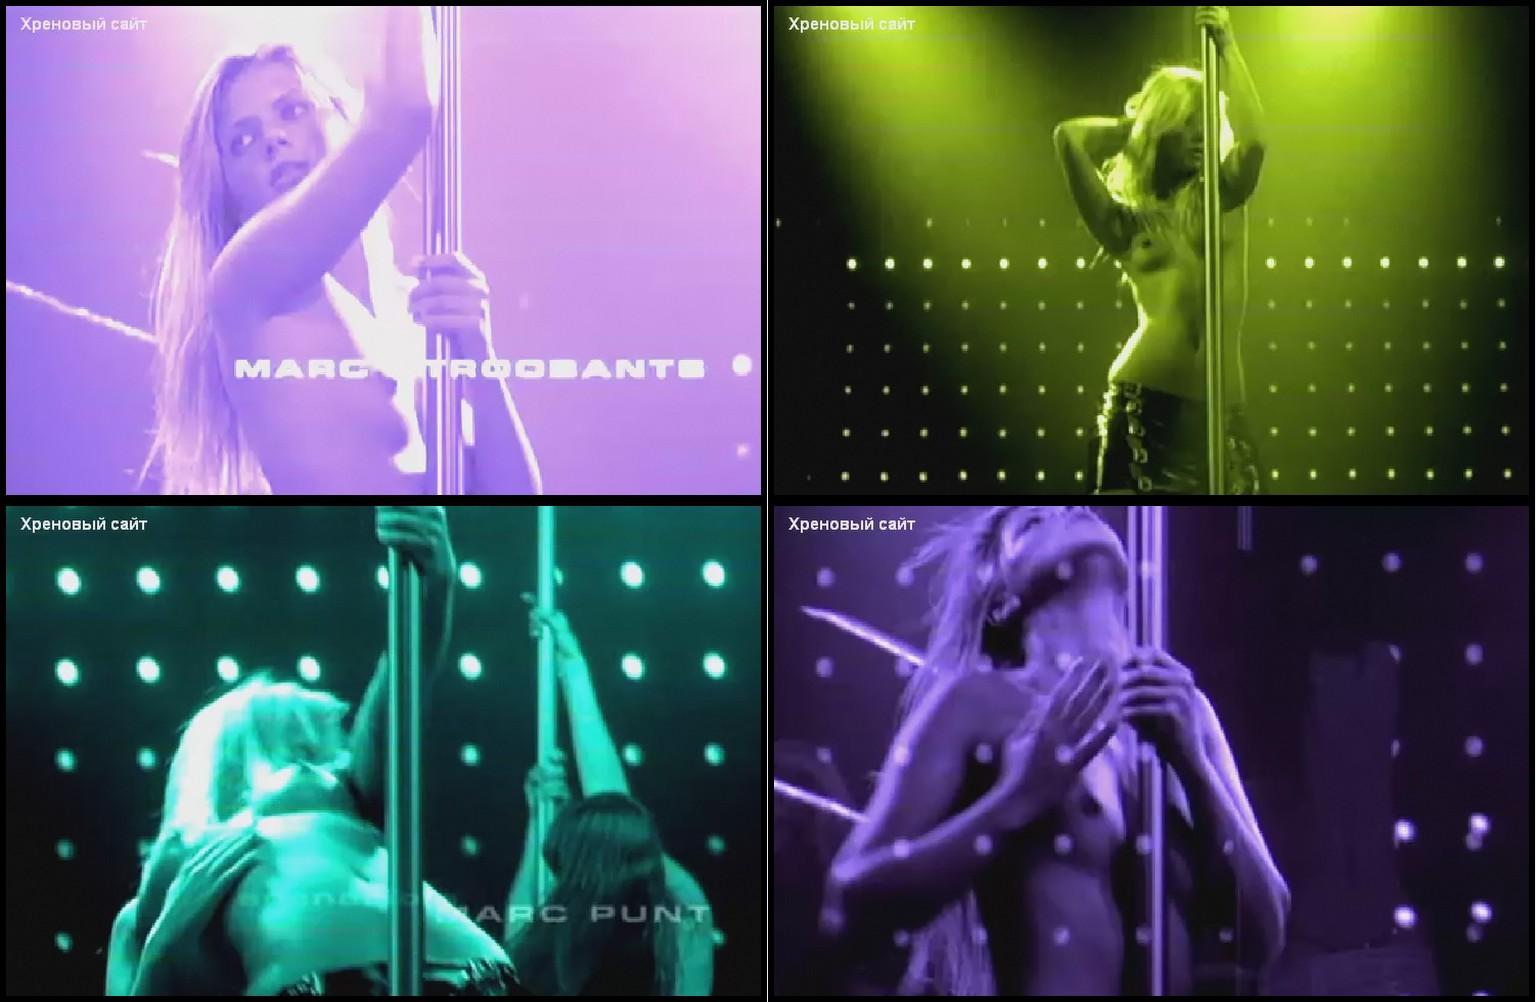 Эротика анастасия задорожная, Голая Анастасия Задорожная фото (75 фотографий.) 11 фотография